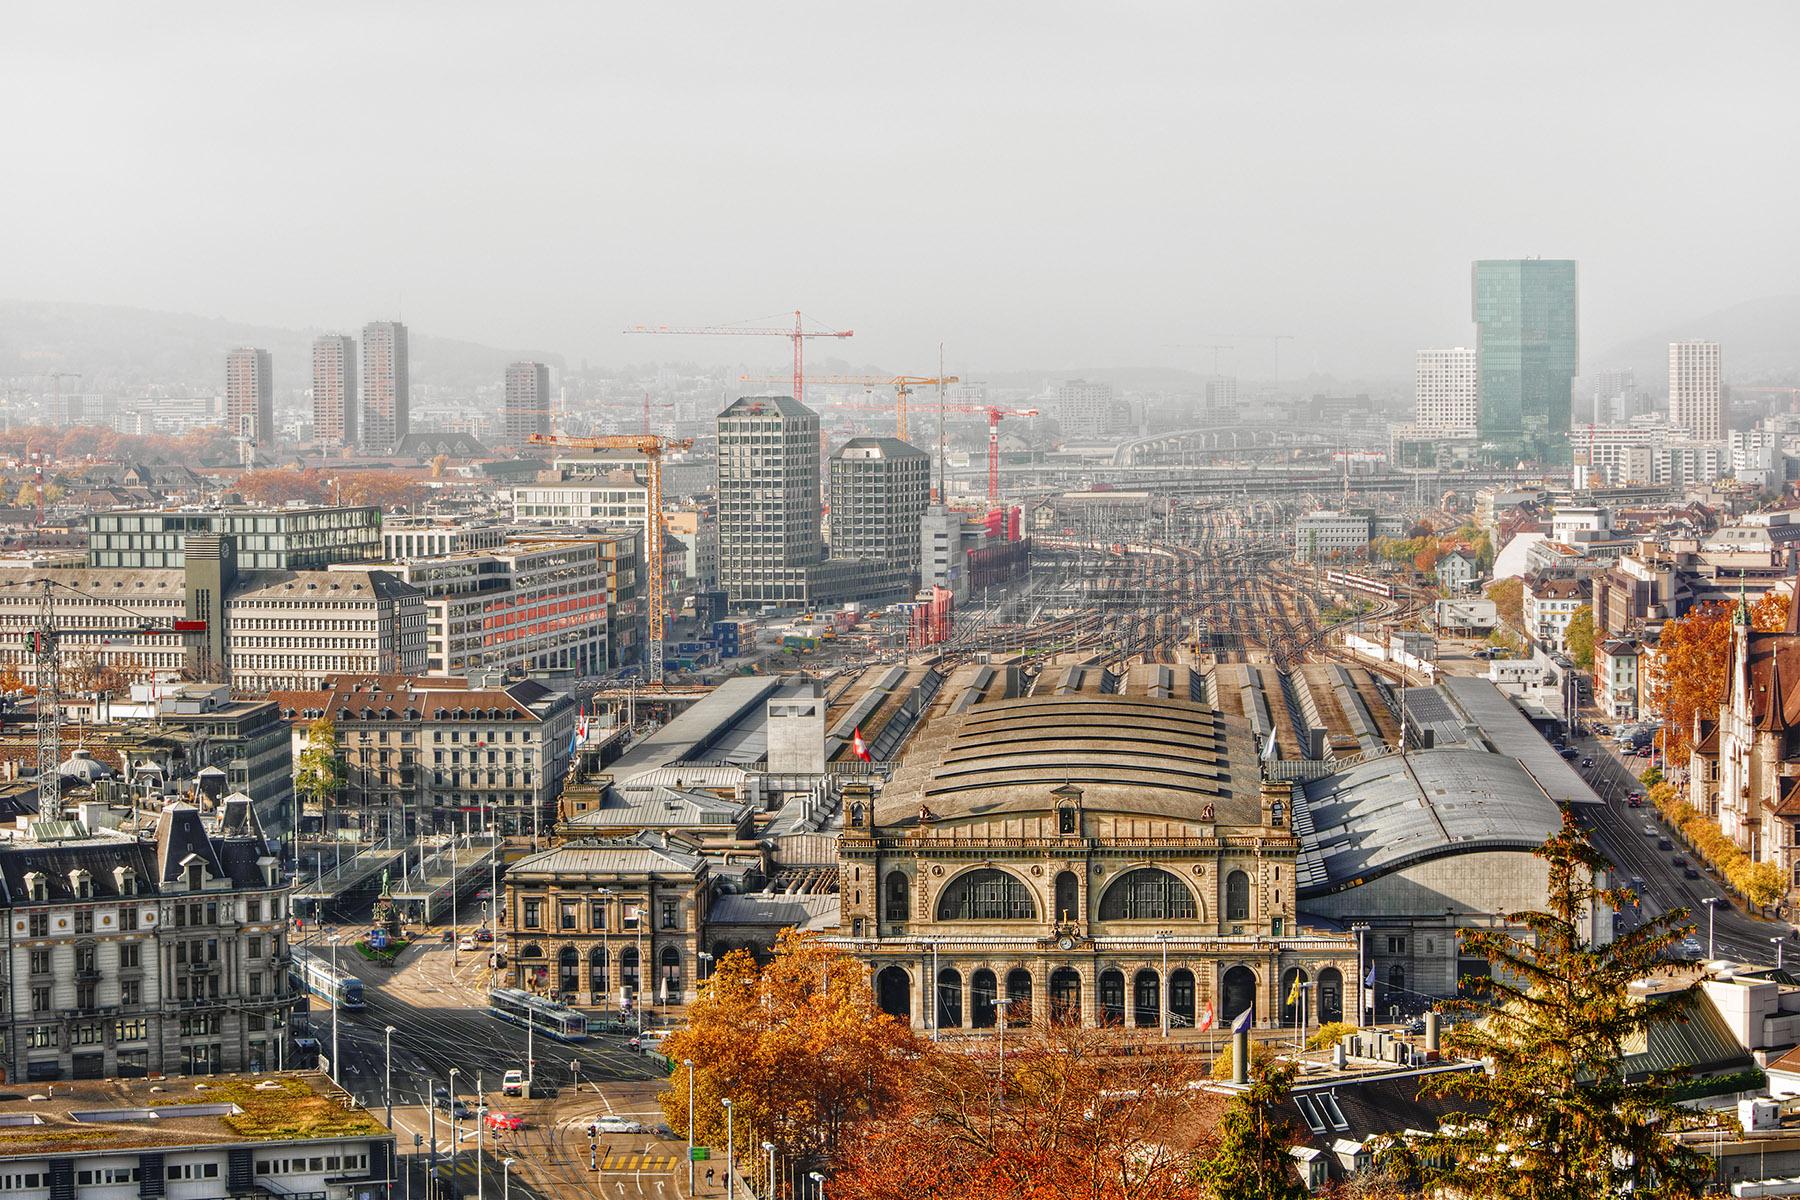 The skyline of Zürich